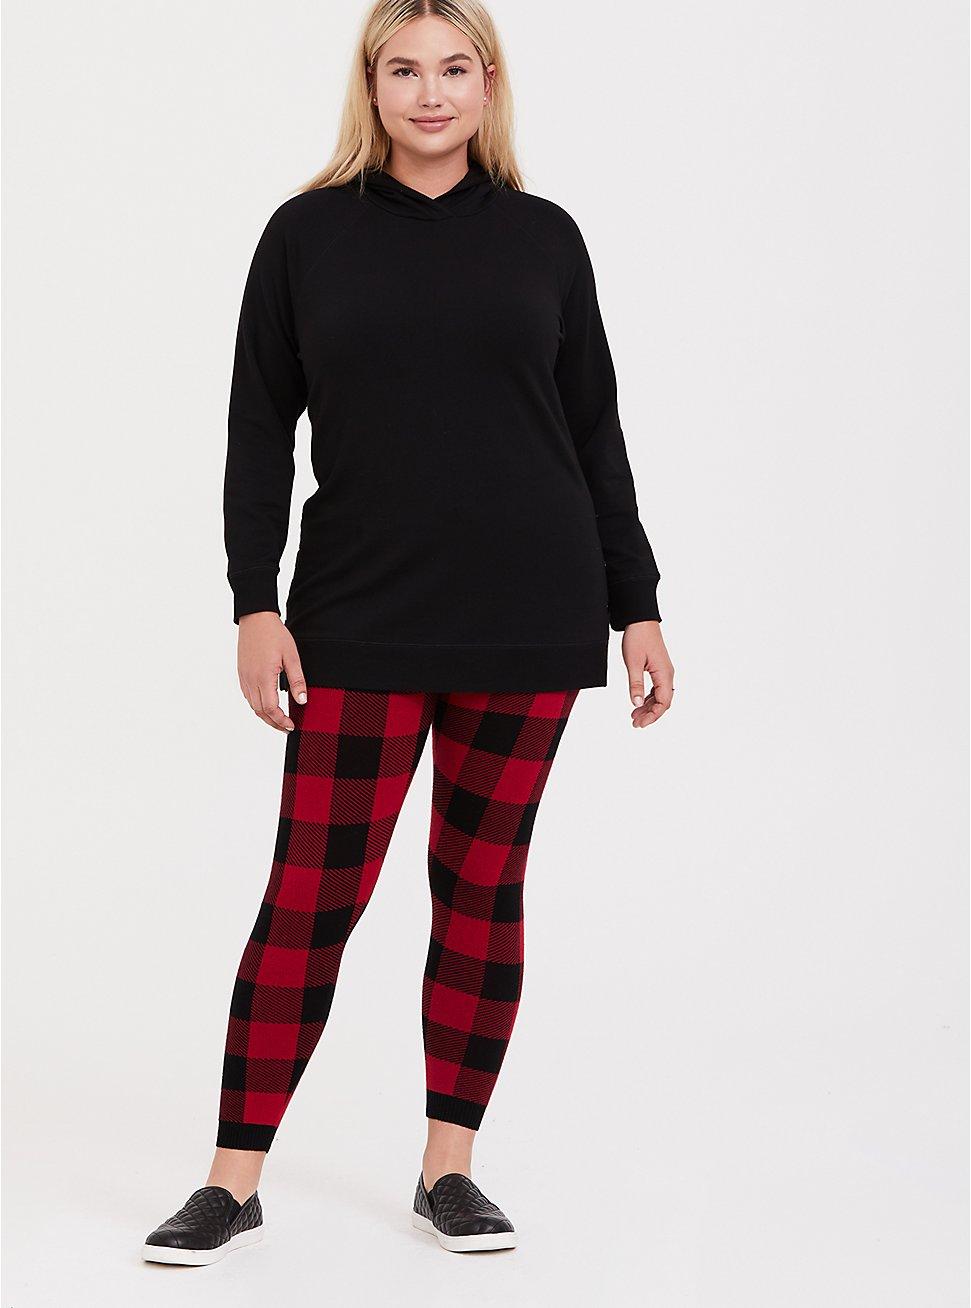 Sweater-Knit Legging - Plaid Red & Black, MULTI, hi-res